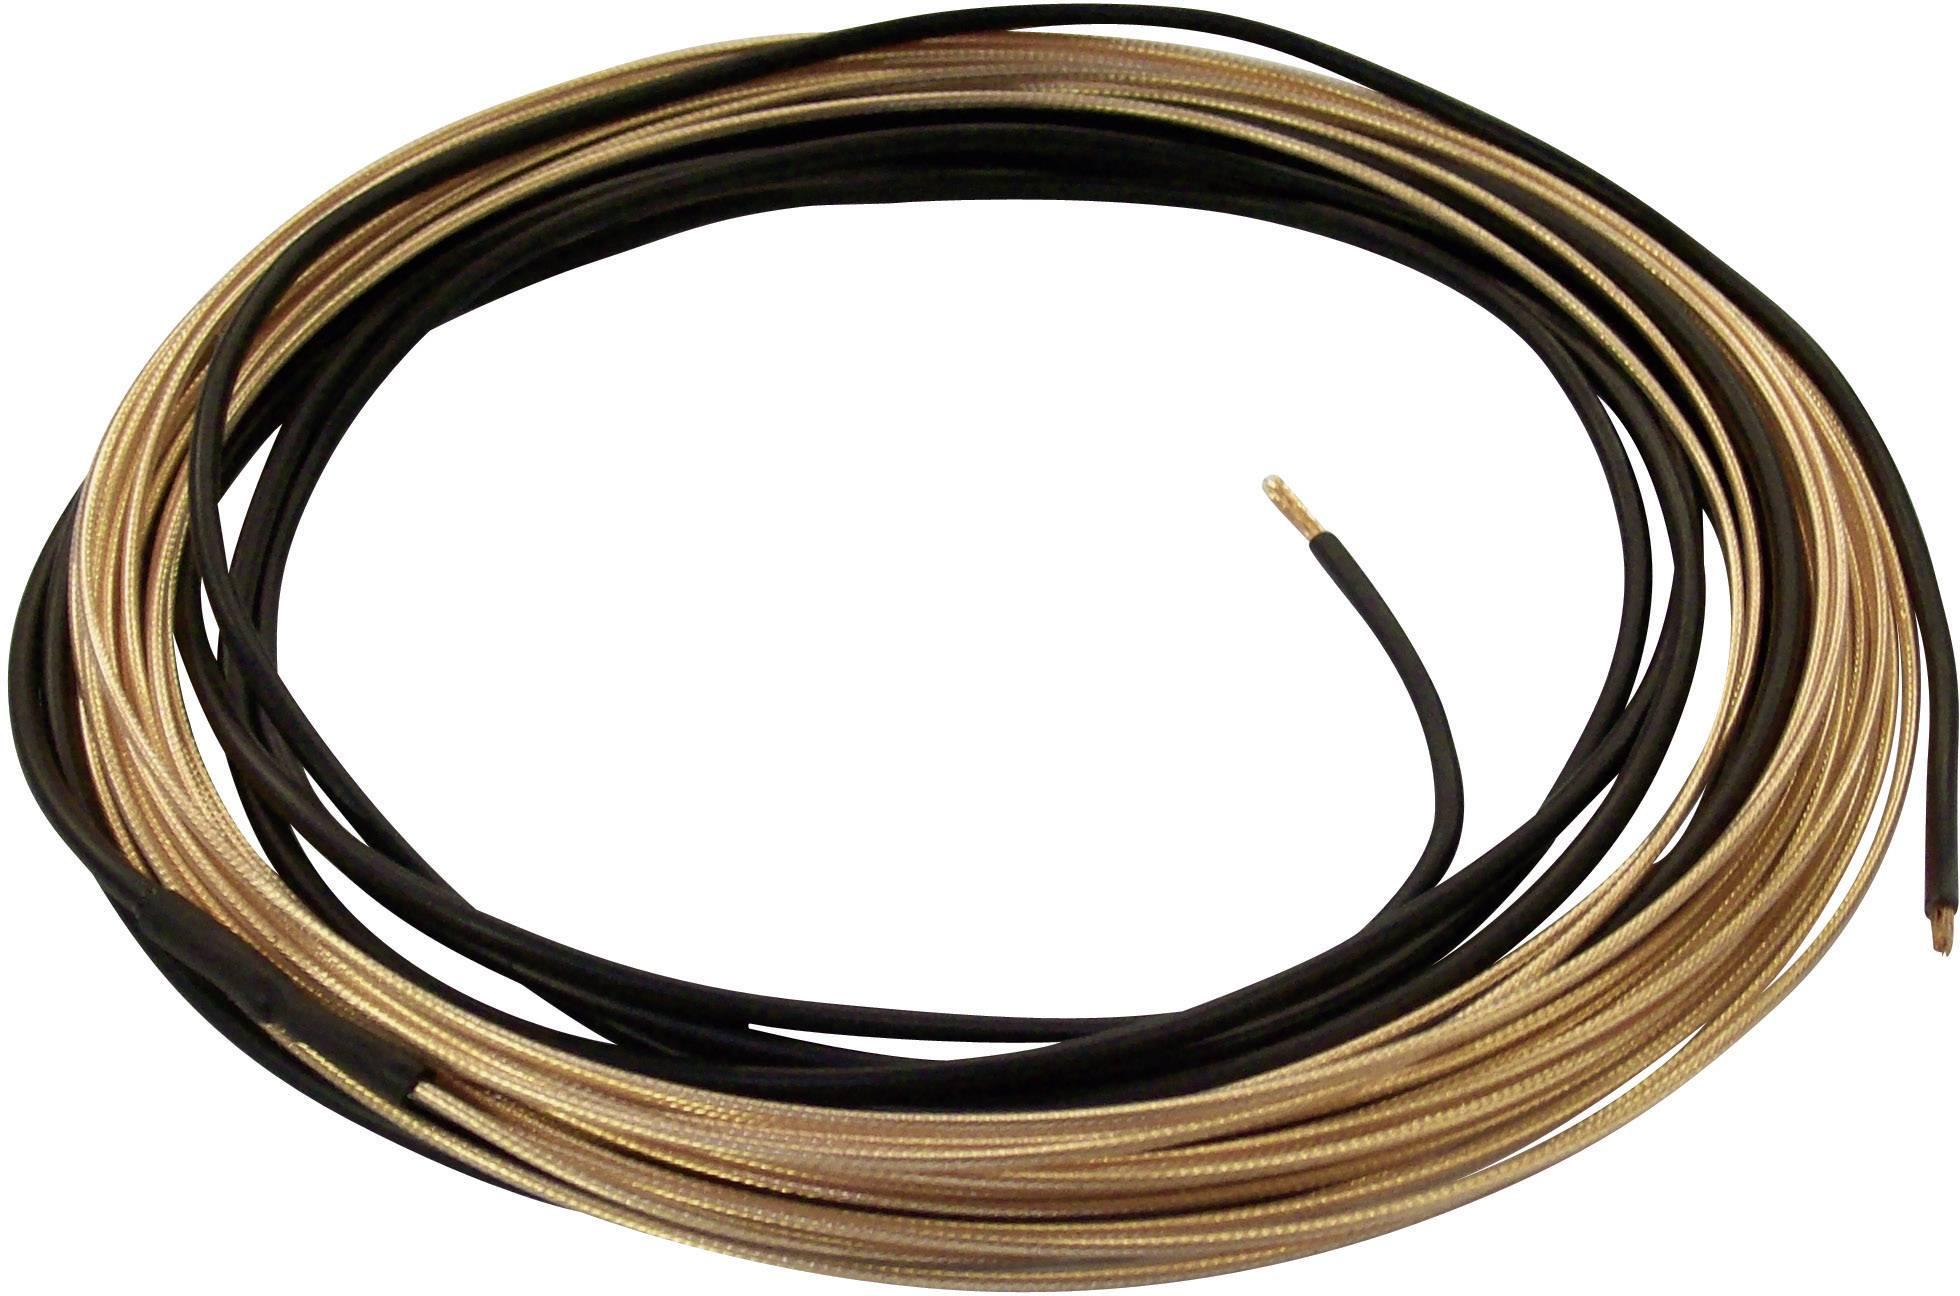 Vykurovací kábel Arnold Rak HK-8,0-12, 120 W, 8 m